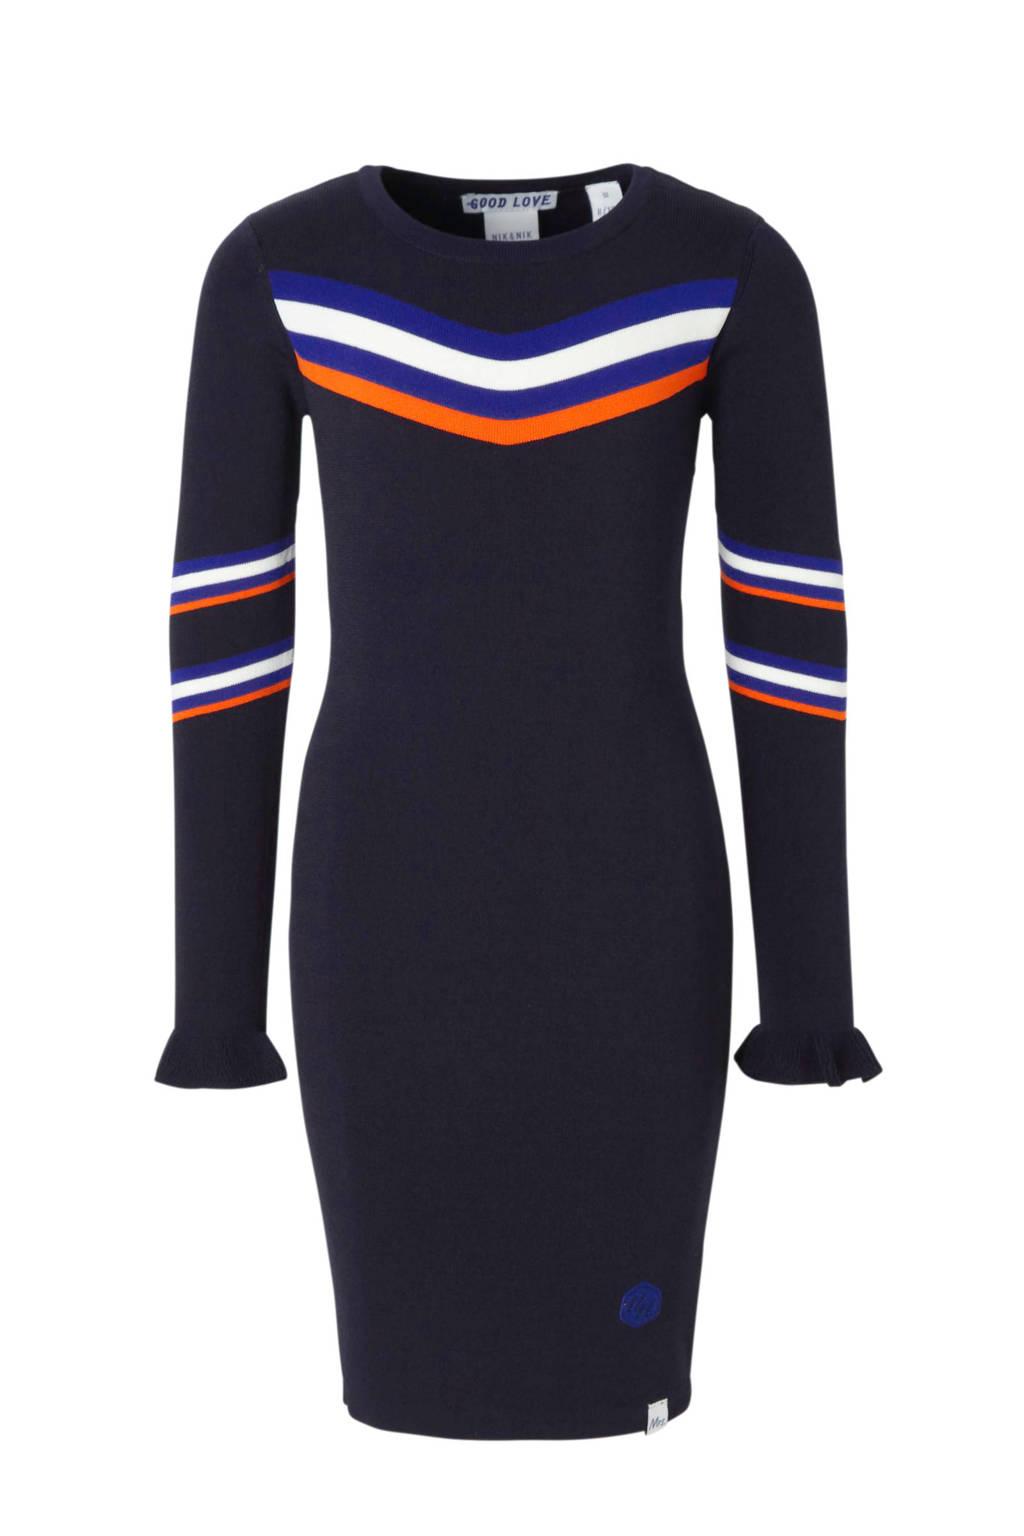 NIK&NIK jurk Joshy Jolie donkerblauw, Donkerblauw